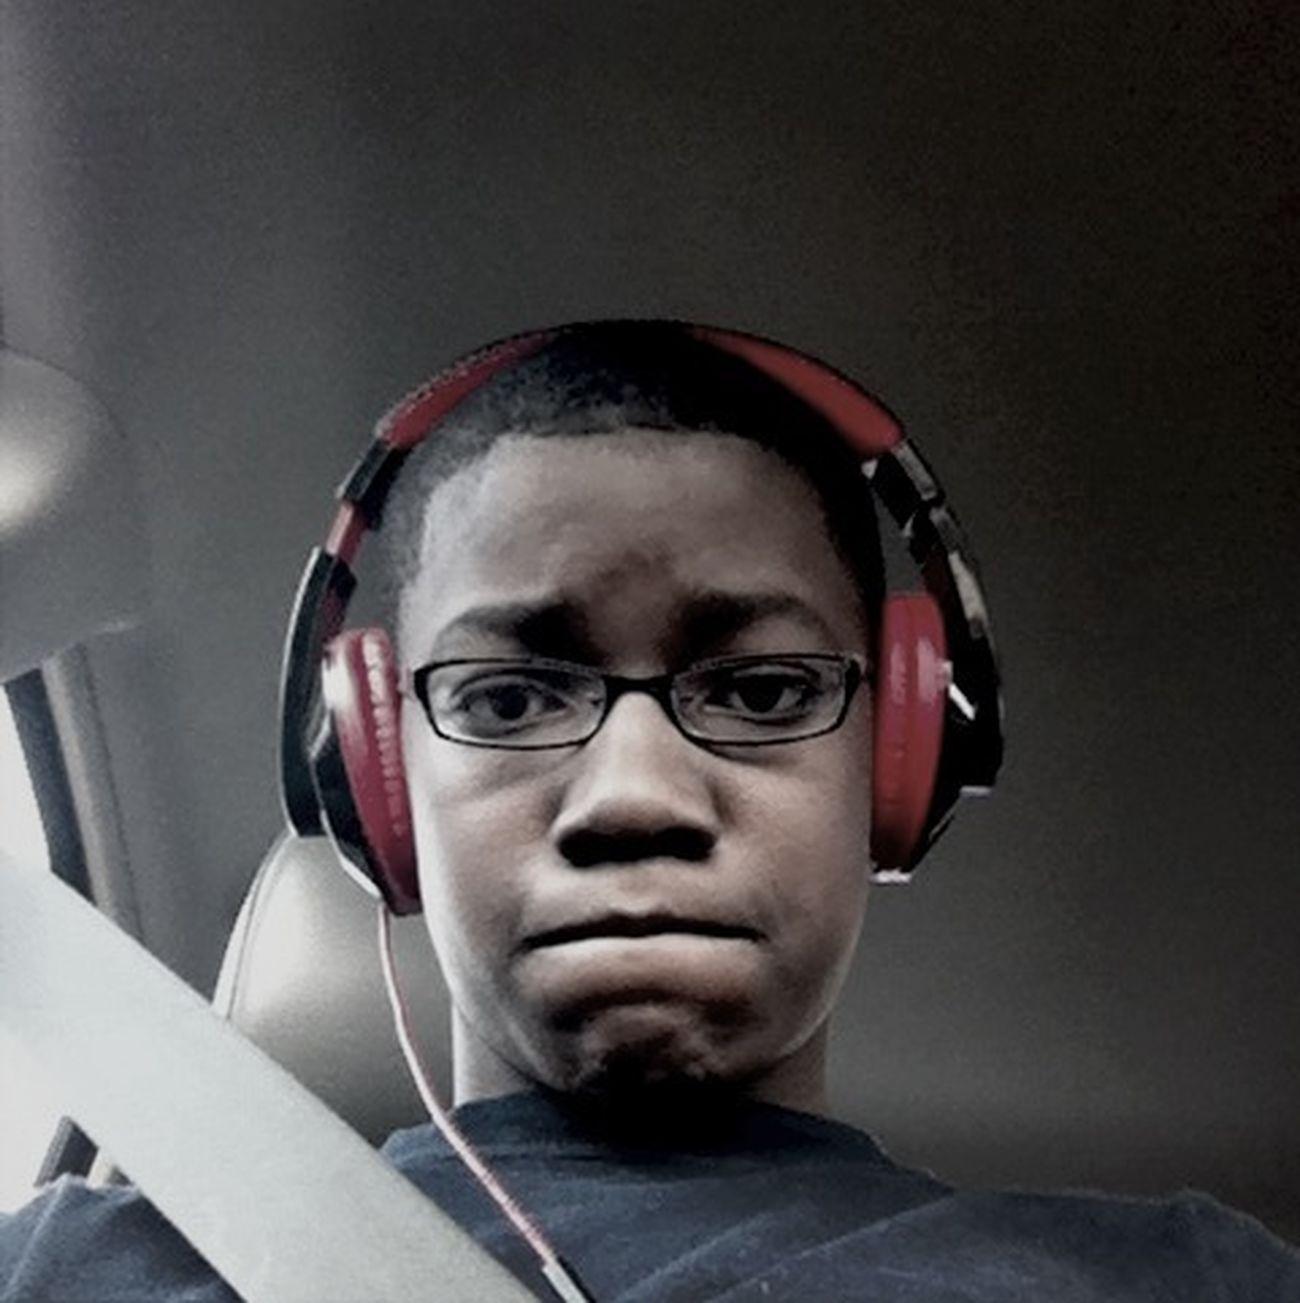 I Was Boolin Wit Mii Headphones